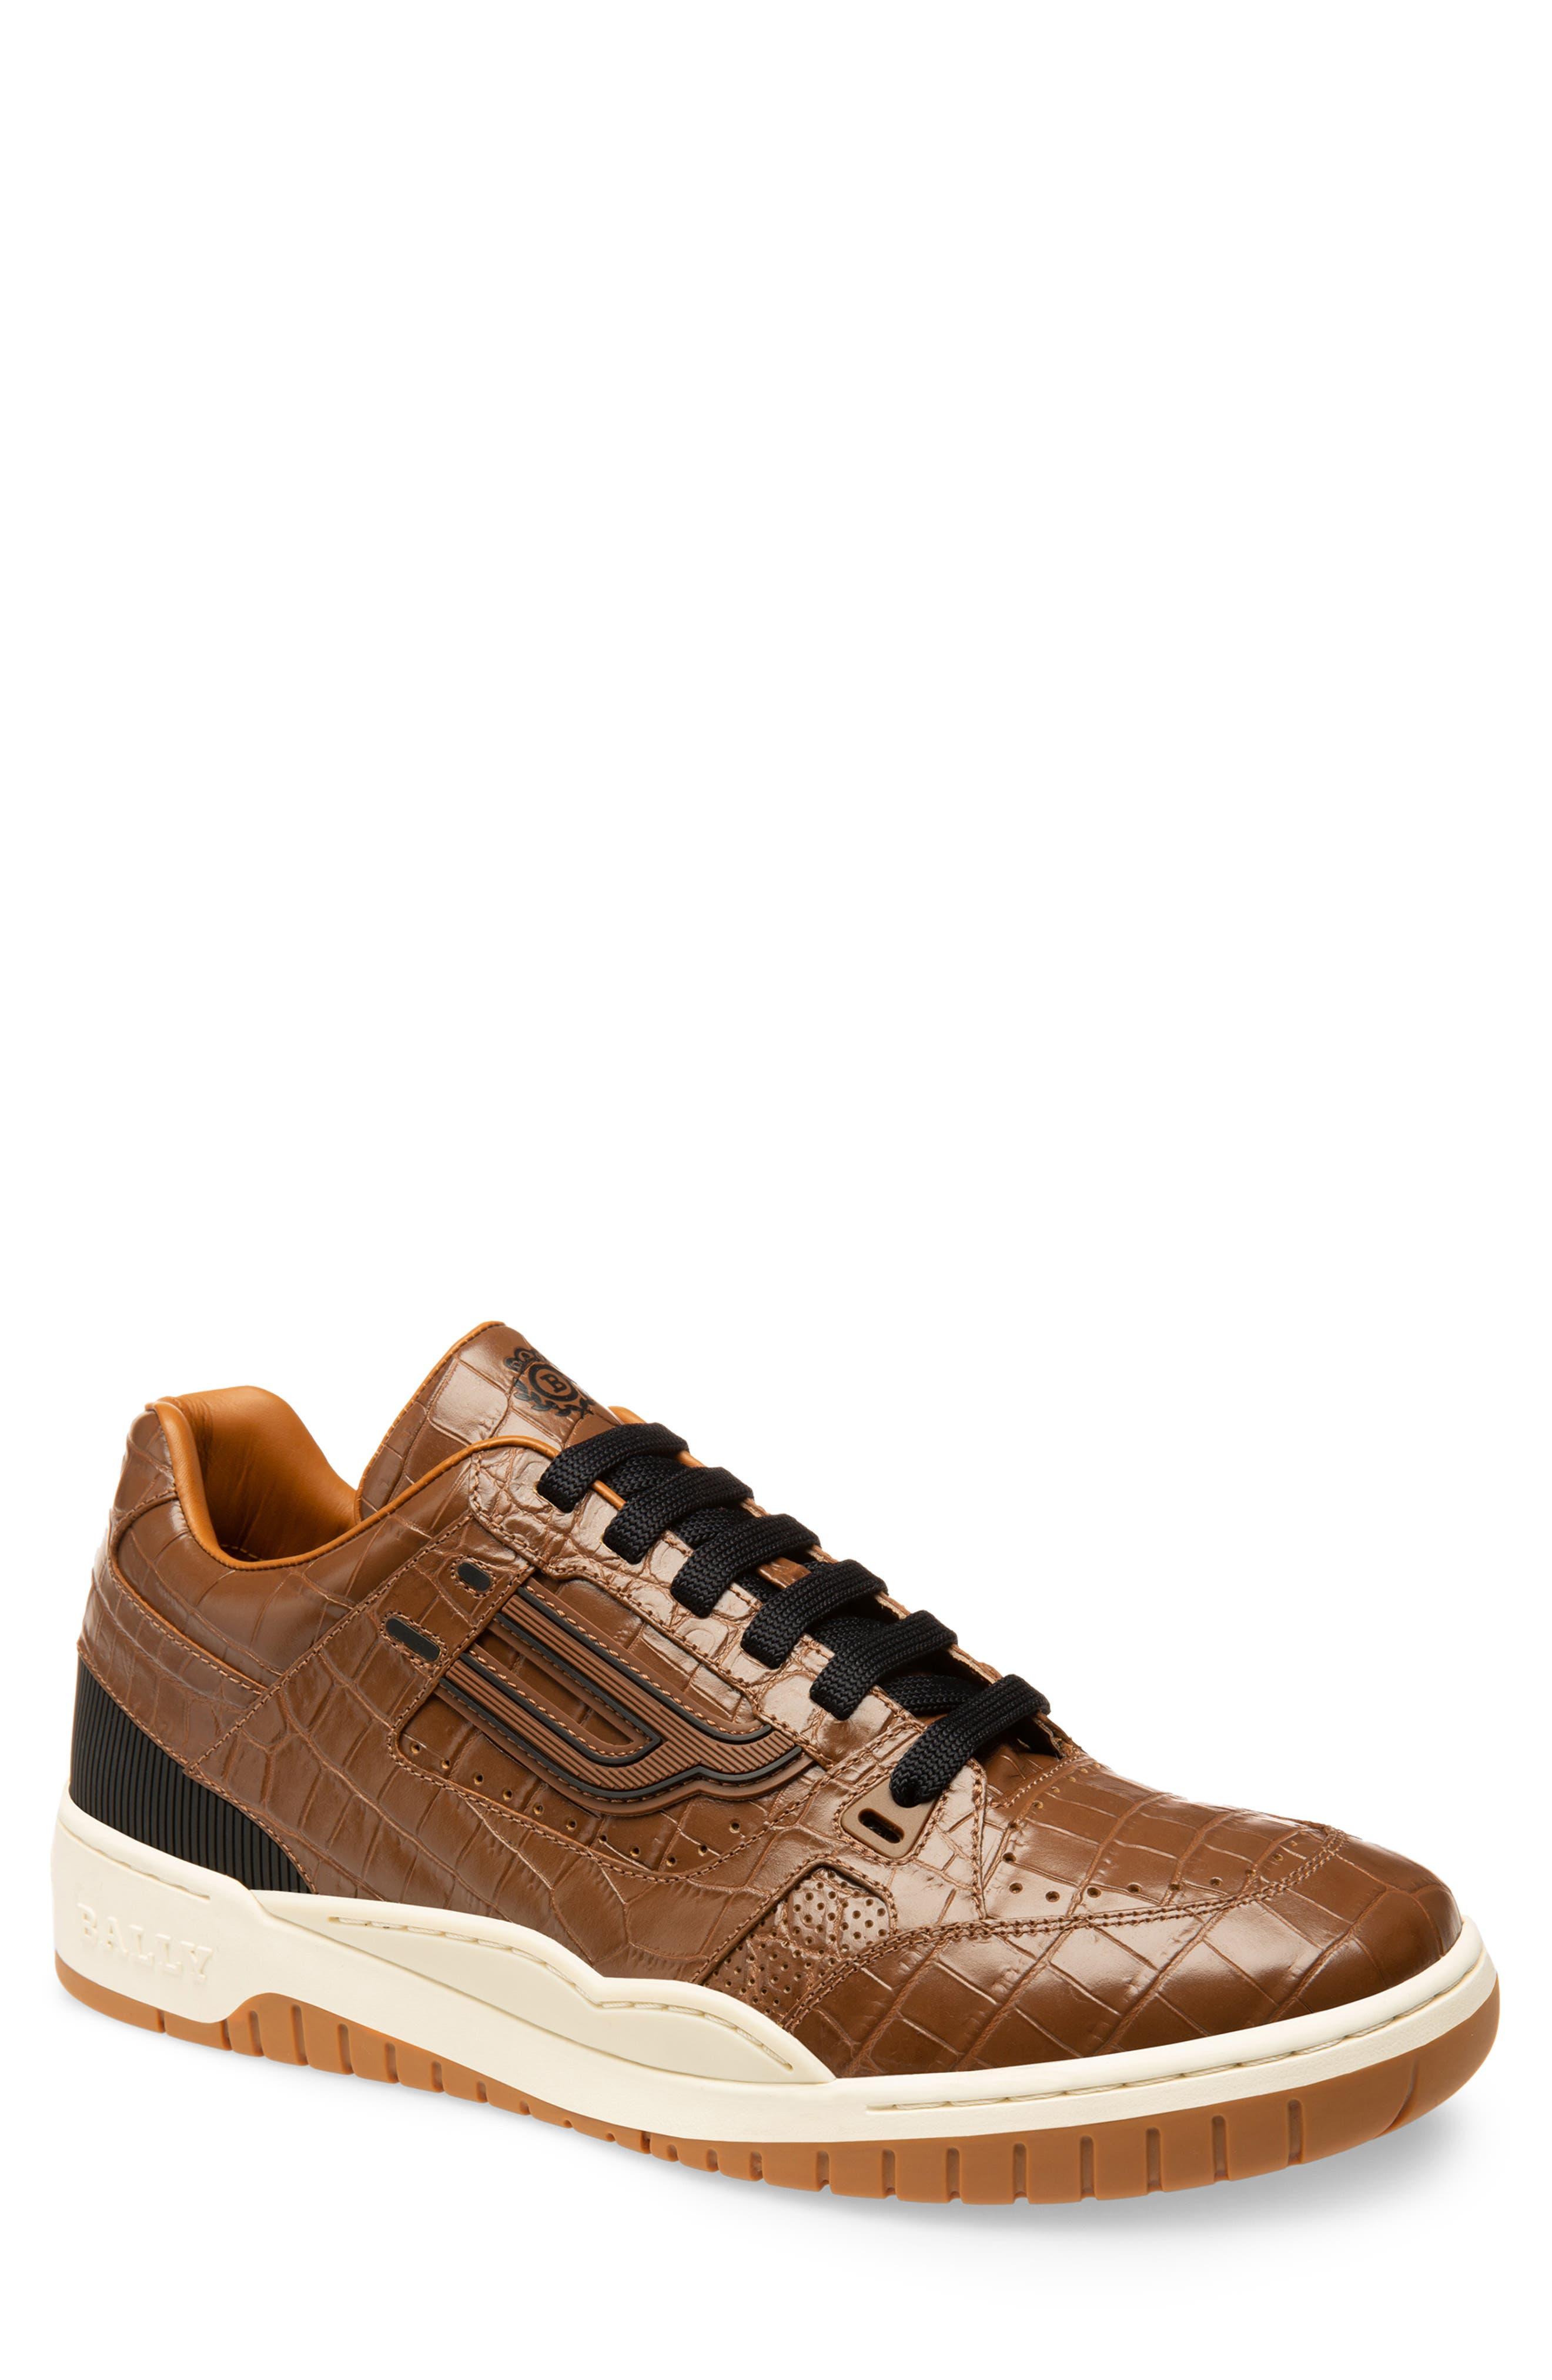 Image of BALLY Kuba Low Top Sneaker